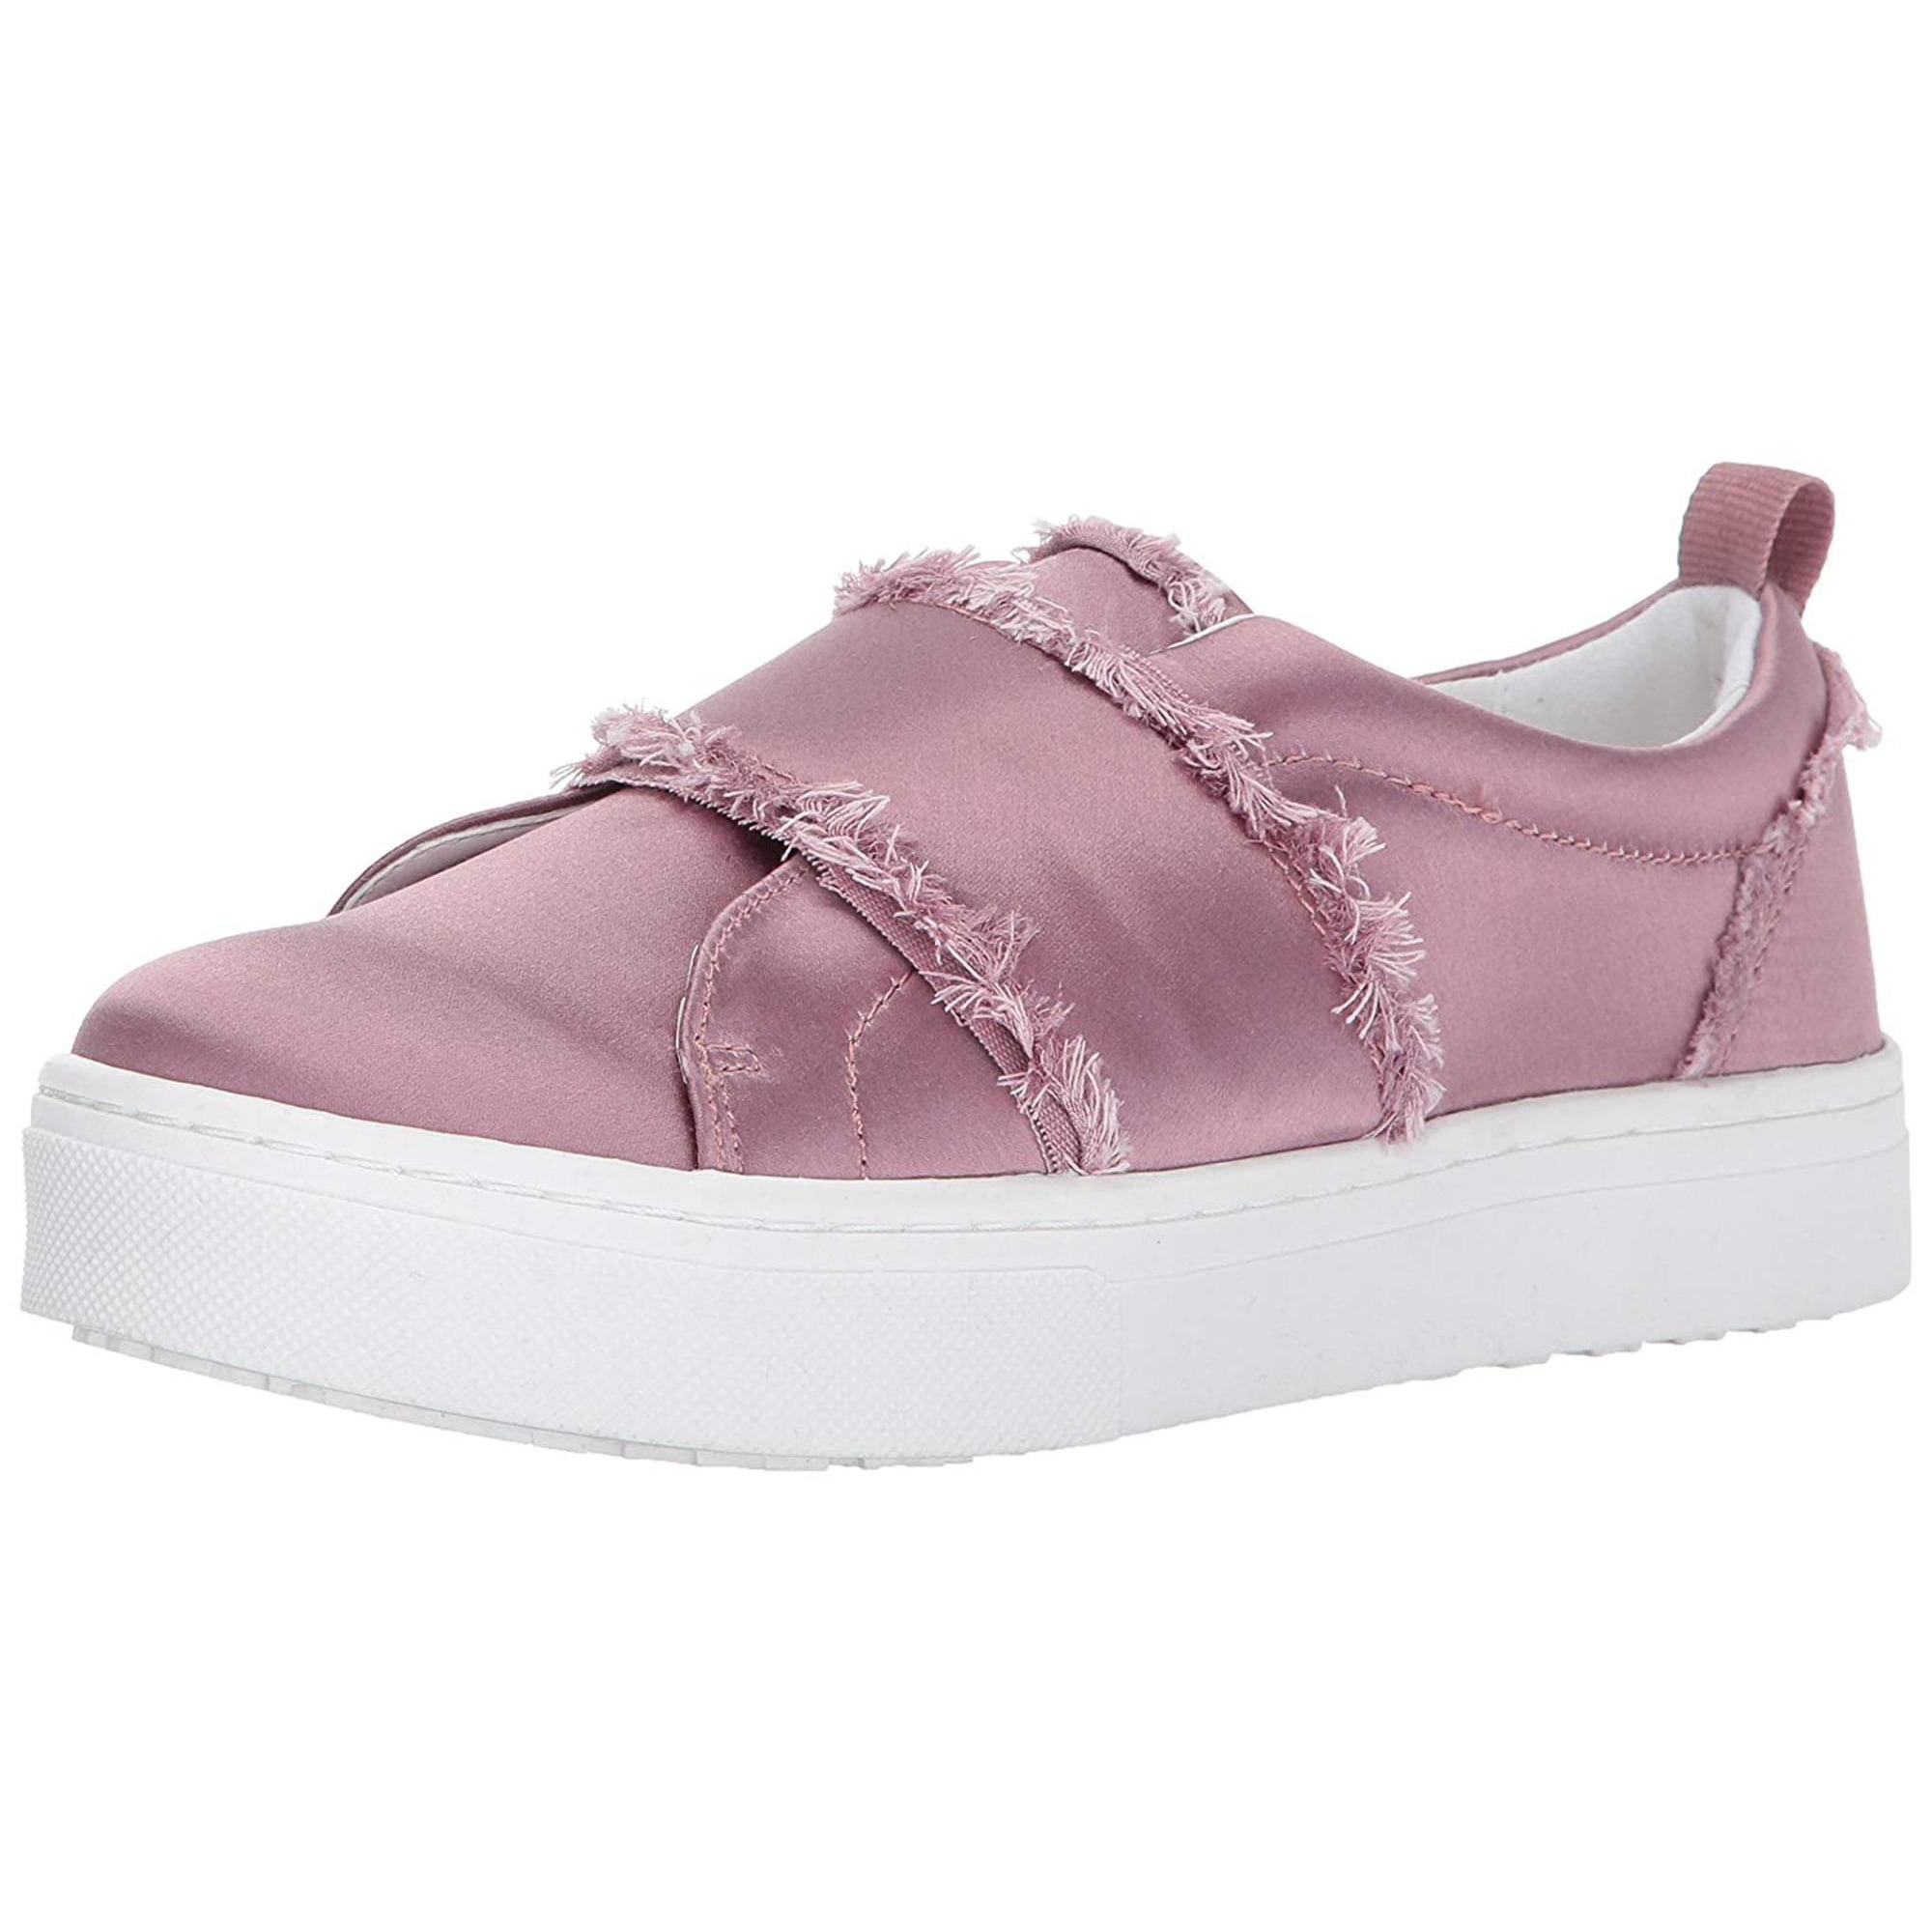 03a4da08d Sam Edelman Womens Levine Low Top Pull On Fashion Sneakers